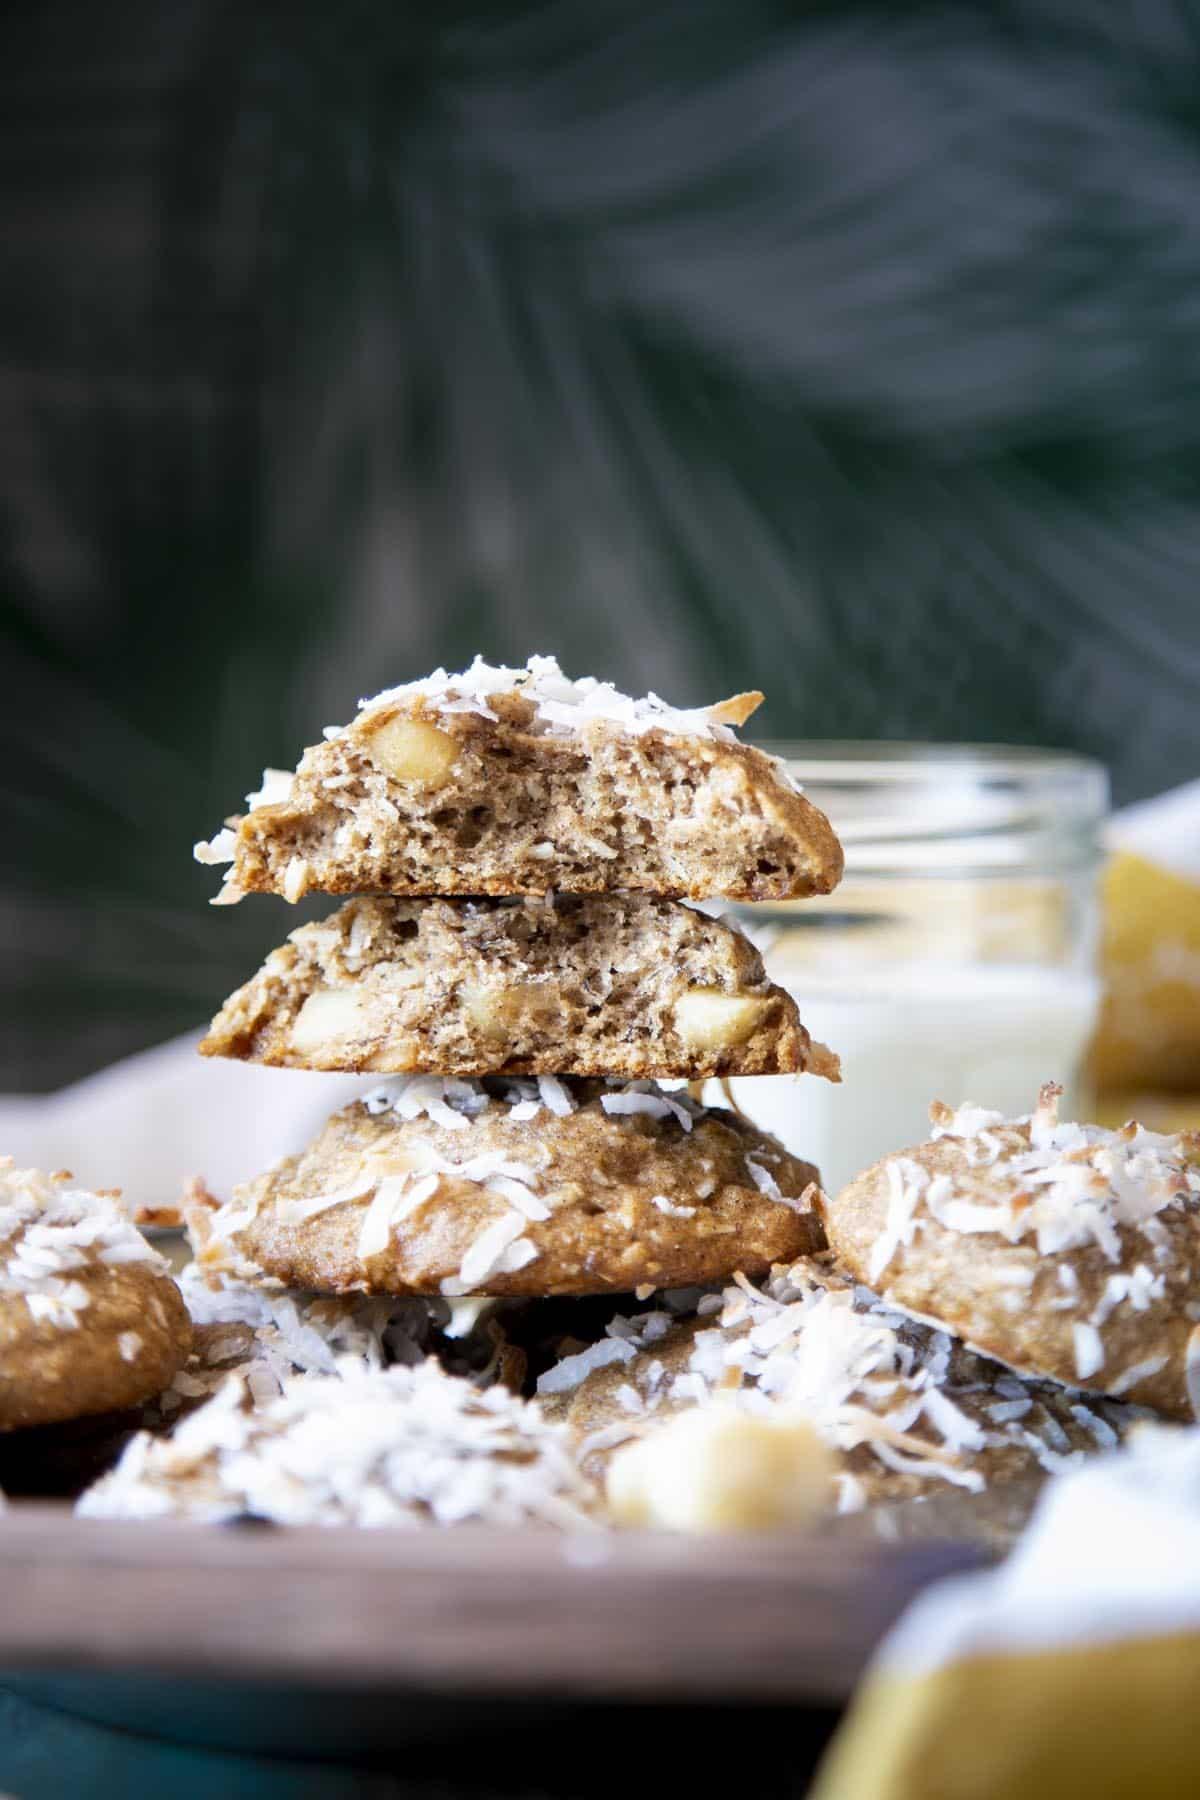 A stack of banana cookies.